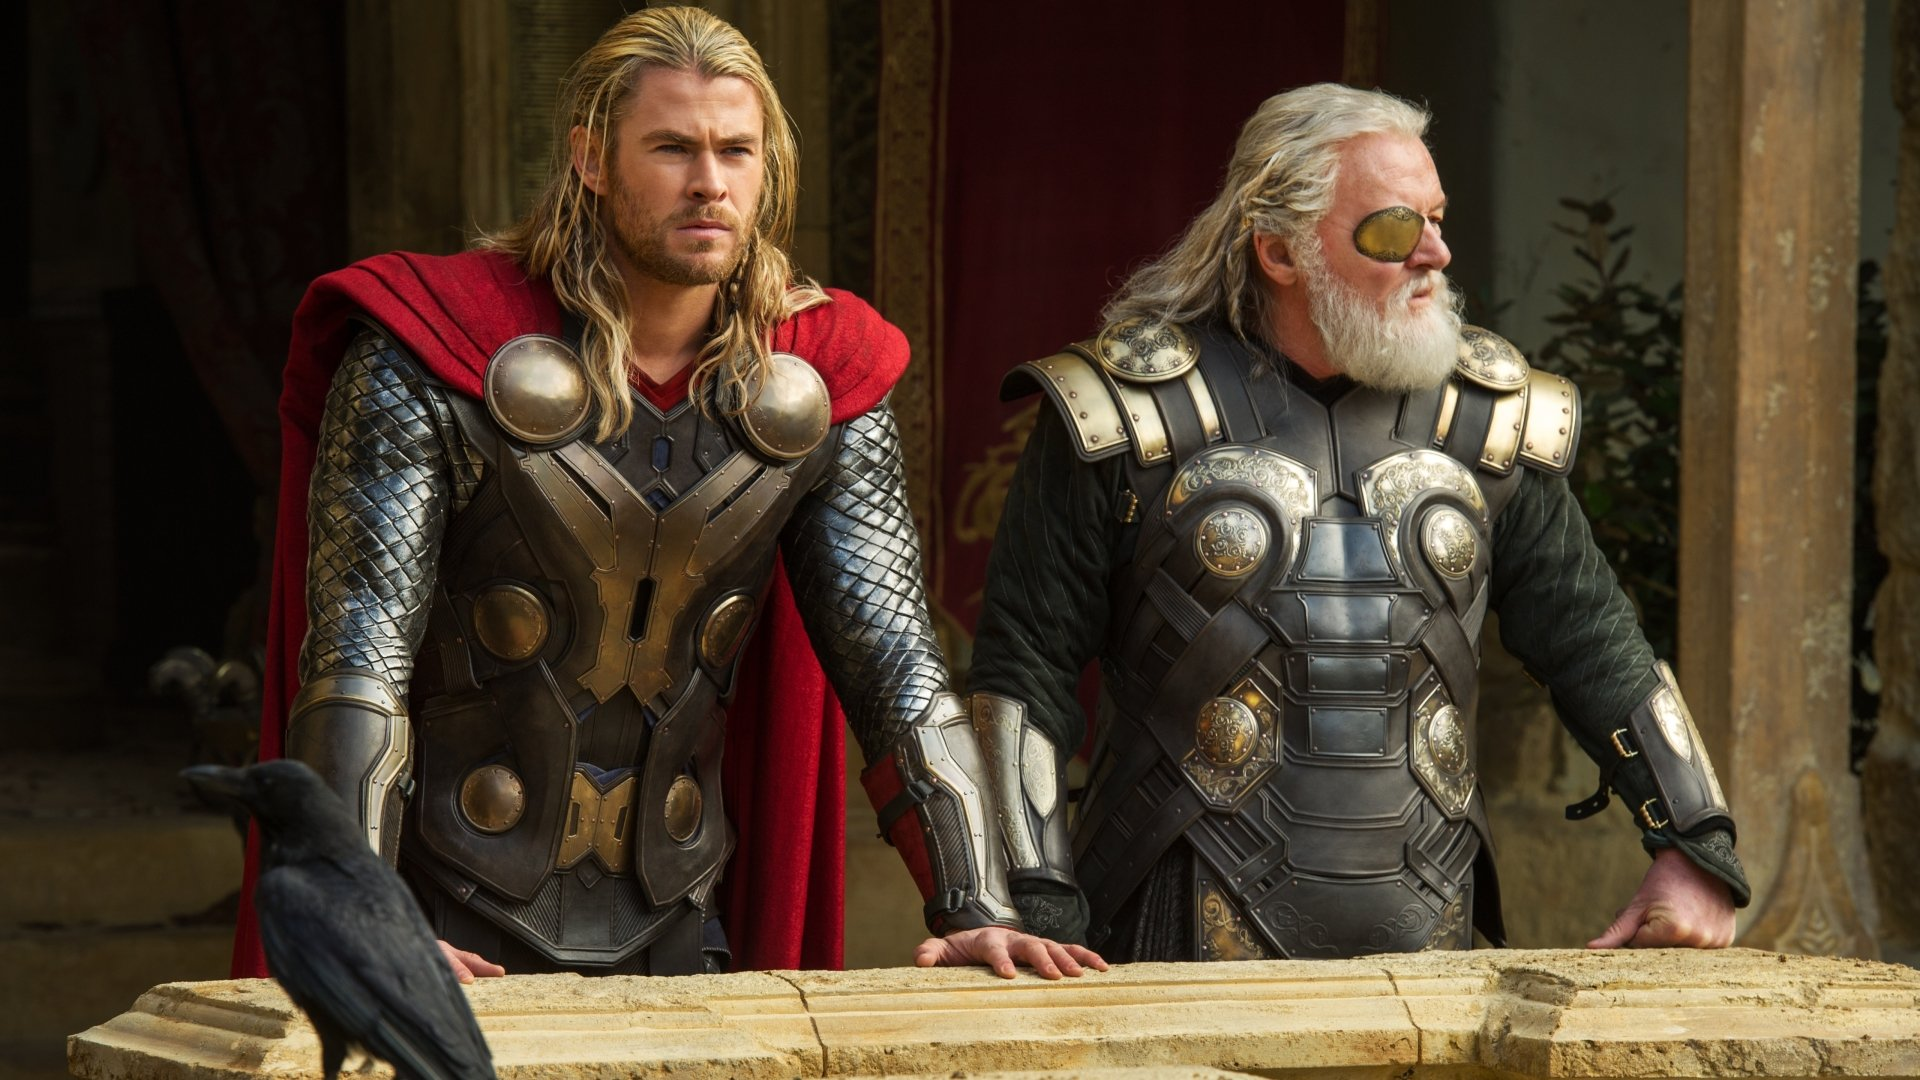 Thor 2, Fondos de Thor El Mundo Oscuro, Wallpapers HD Gratis